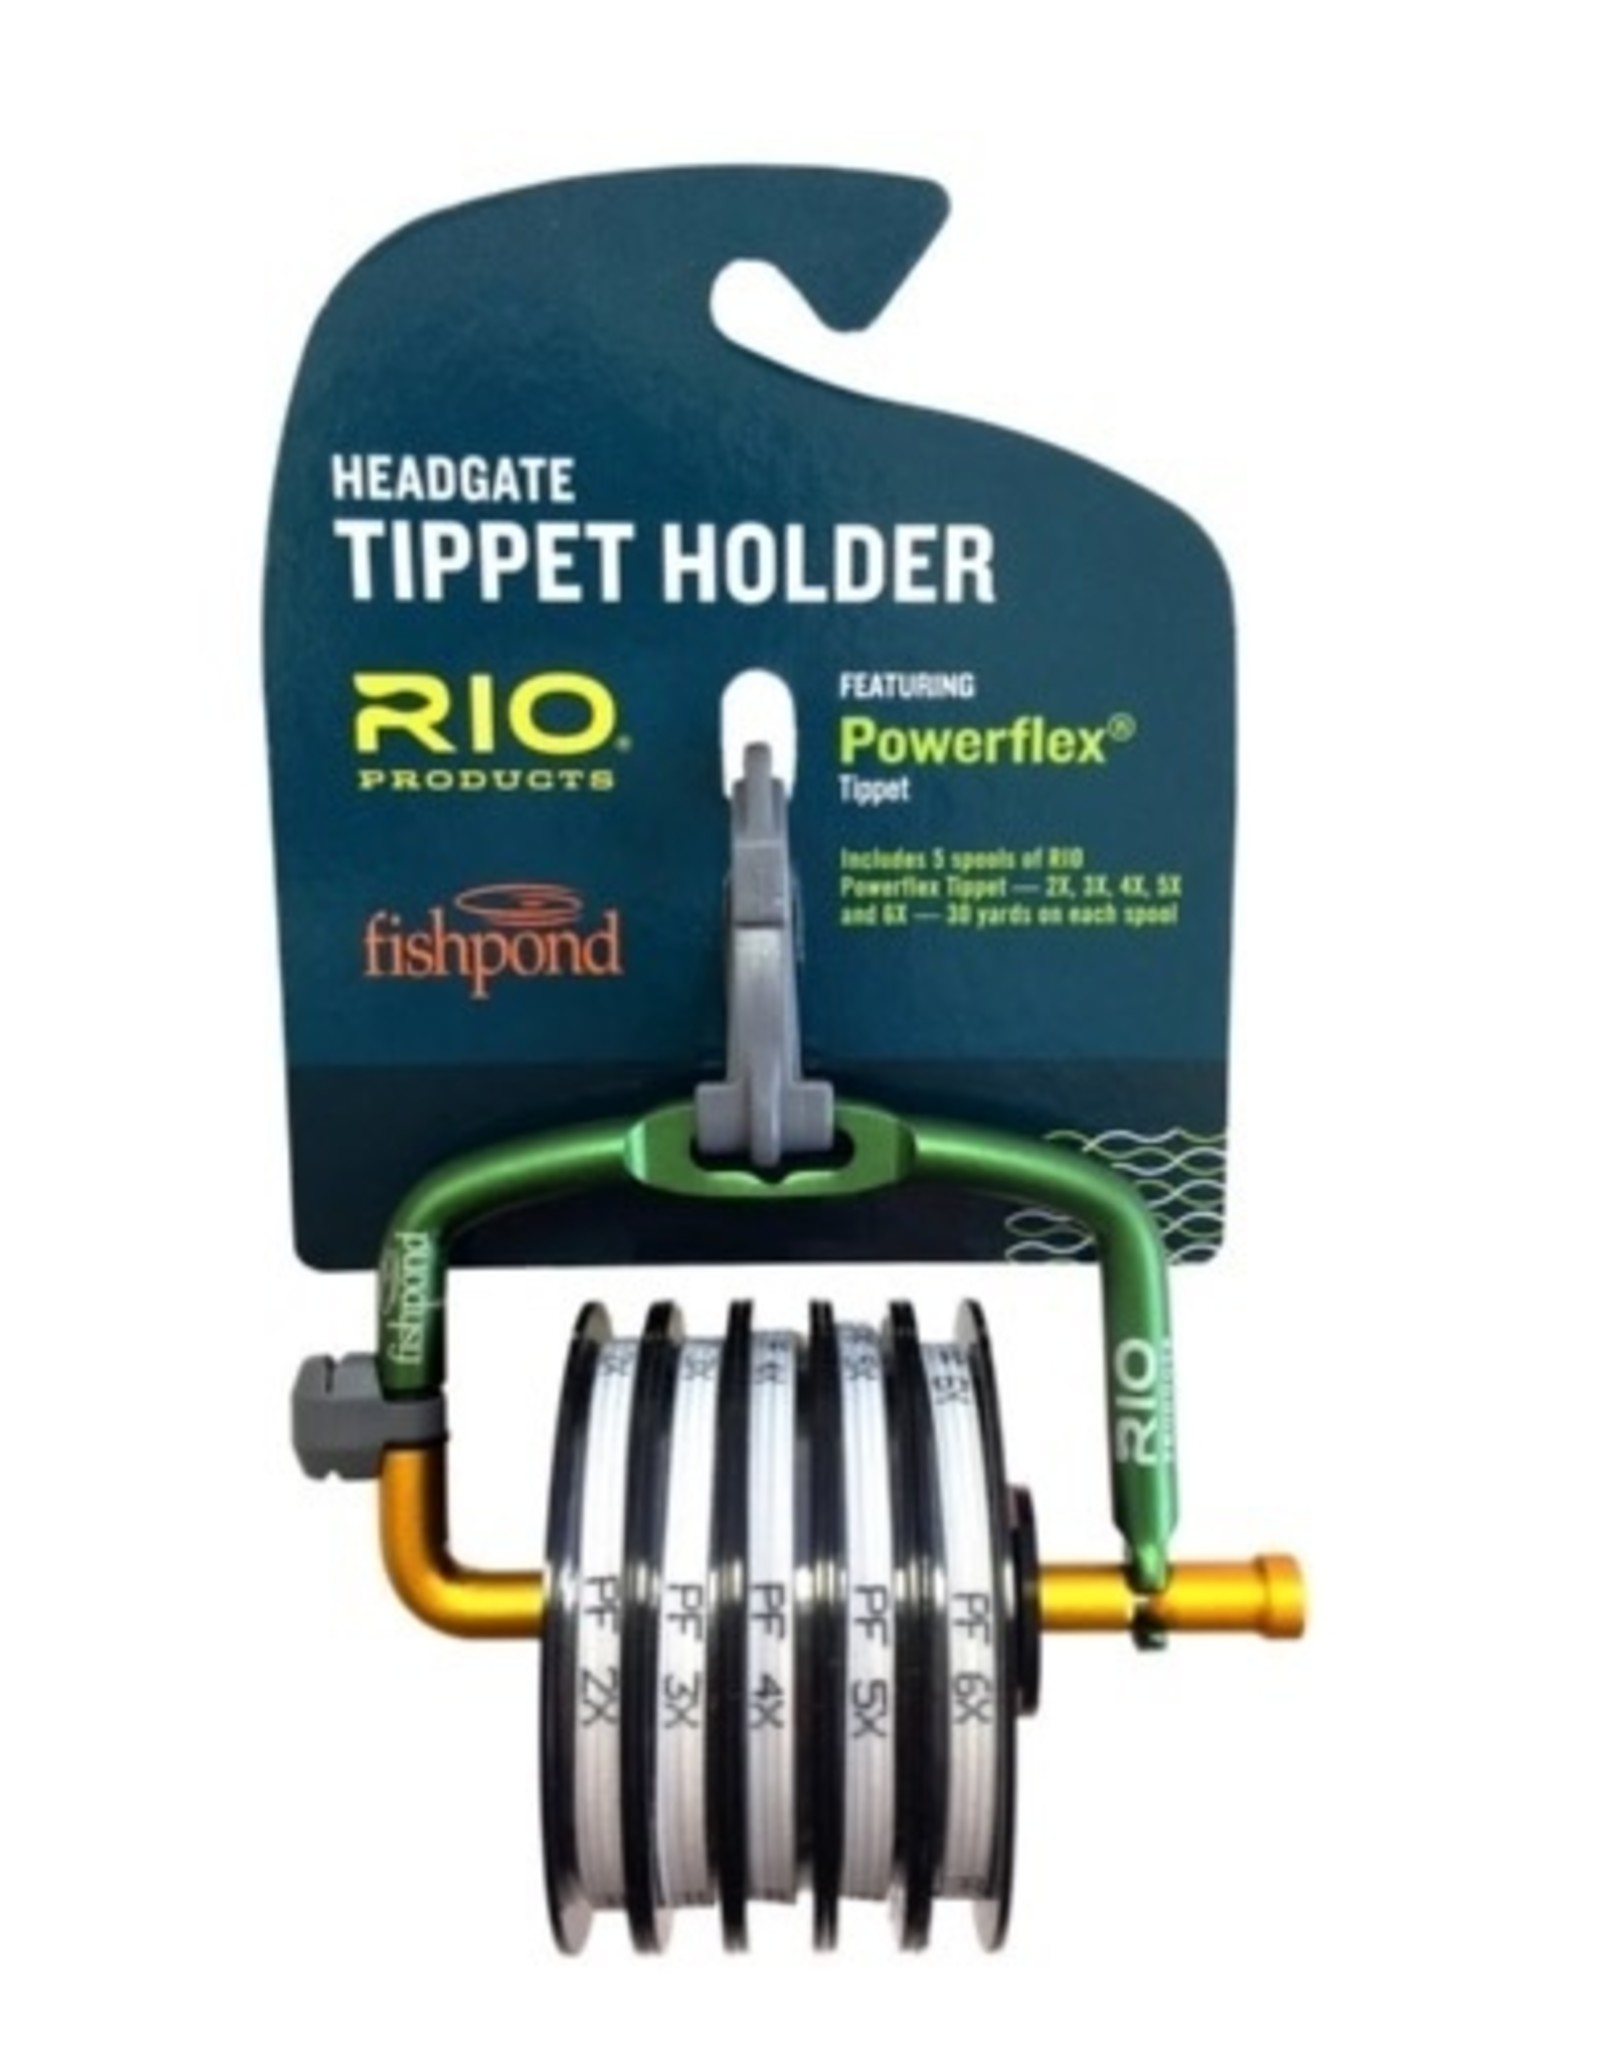 Rio Rio Headgate Powerflex Tippet Holder with 2X-6X